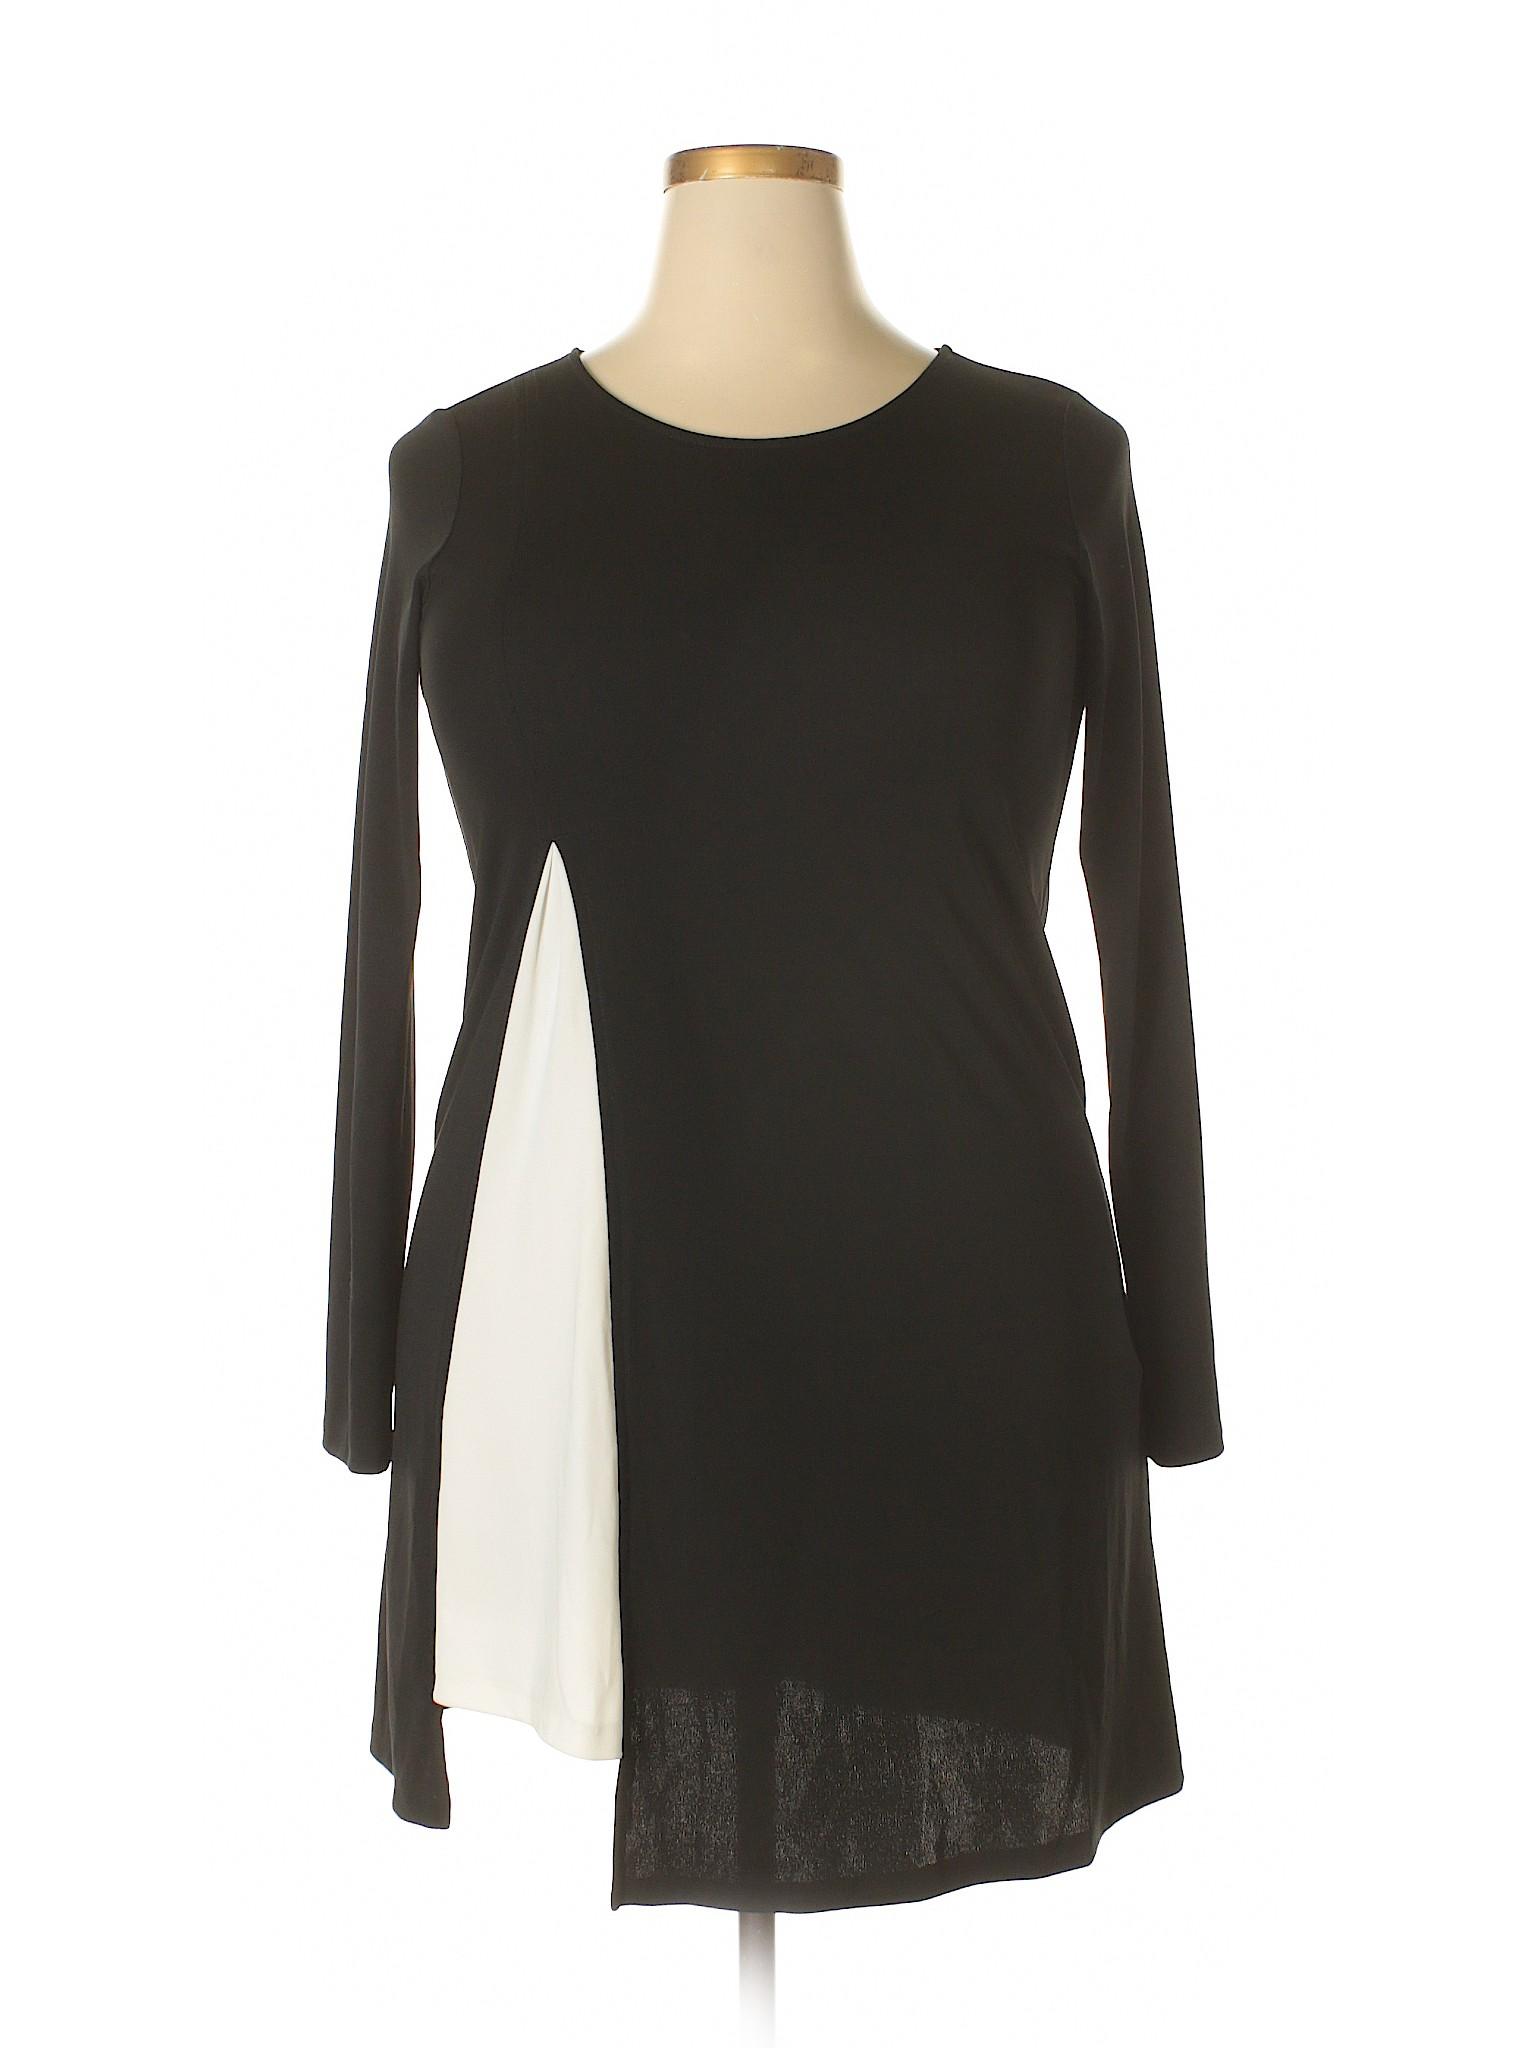 amp;B Collection Boutique Zara winter Dress W Casual WxxAq4zwO1